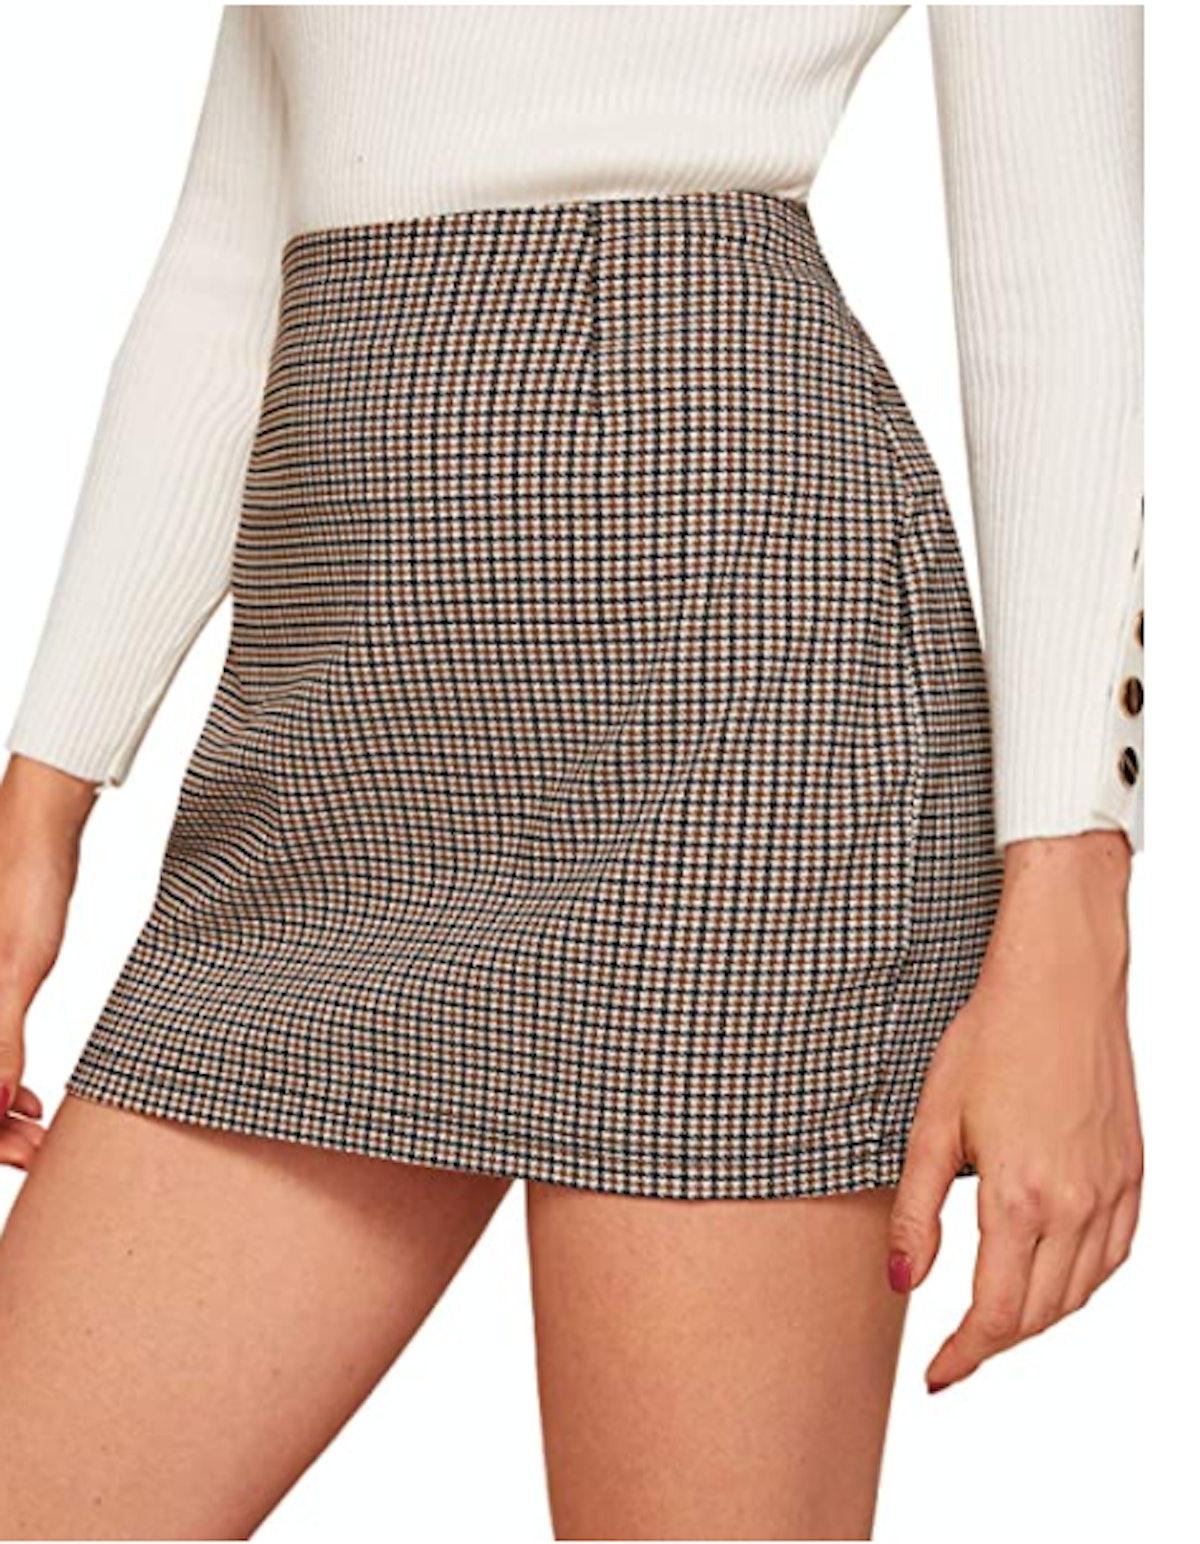 Floerns Plaid High Waist Mini Skirt